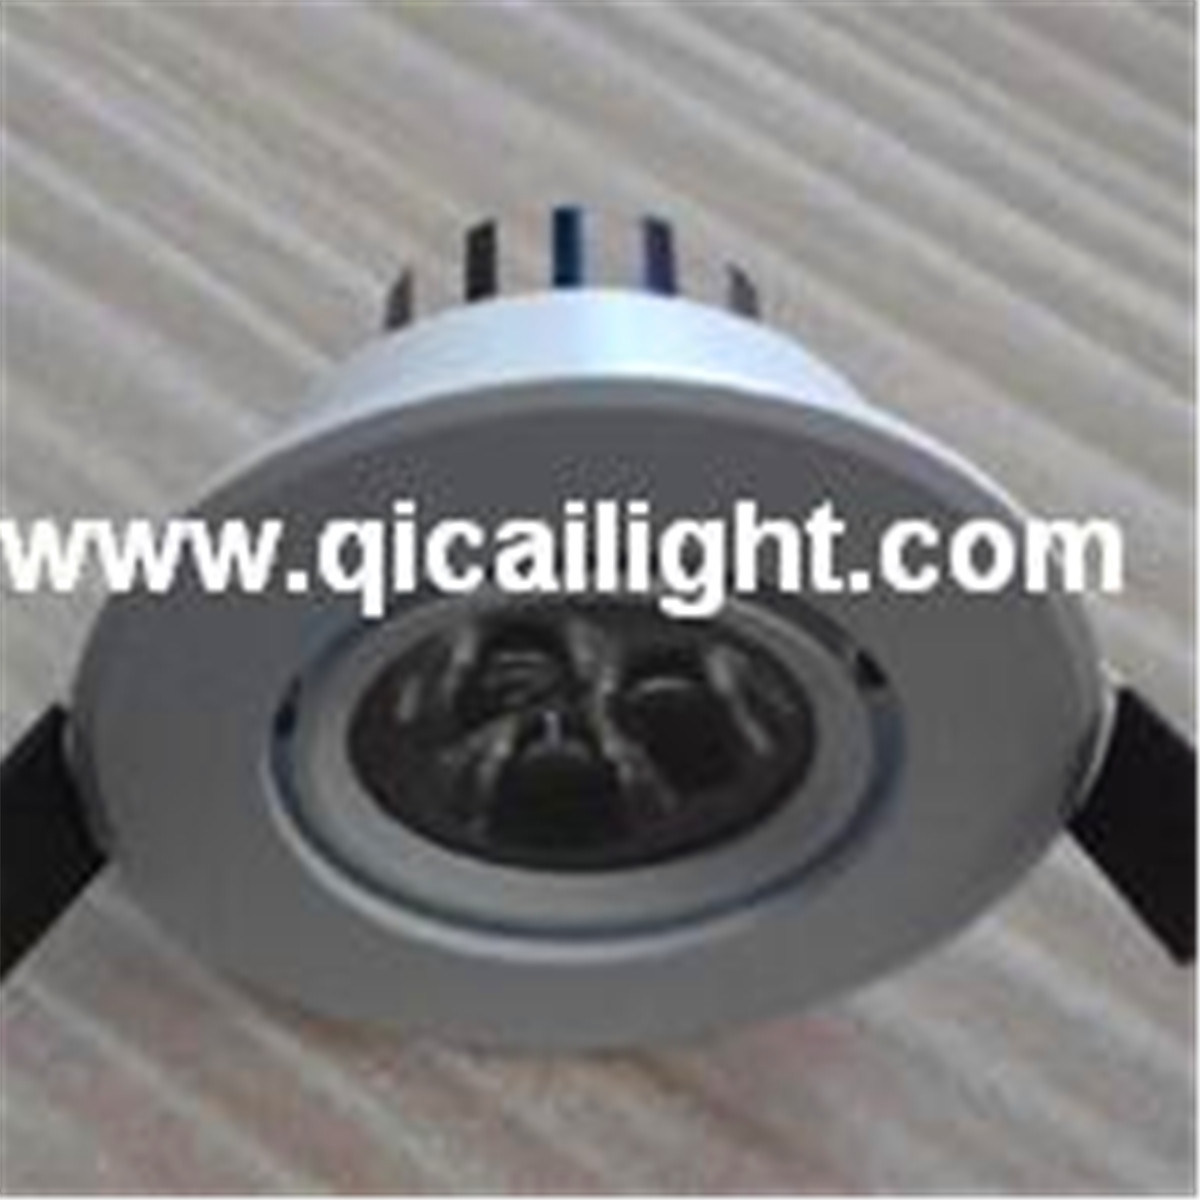 18X1W LED Downlight